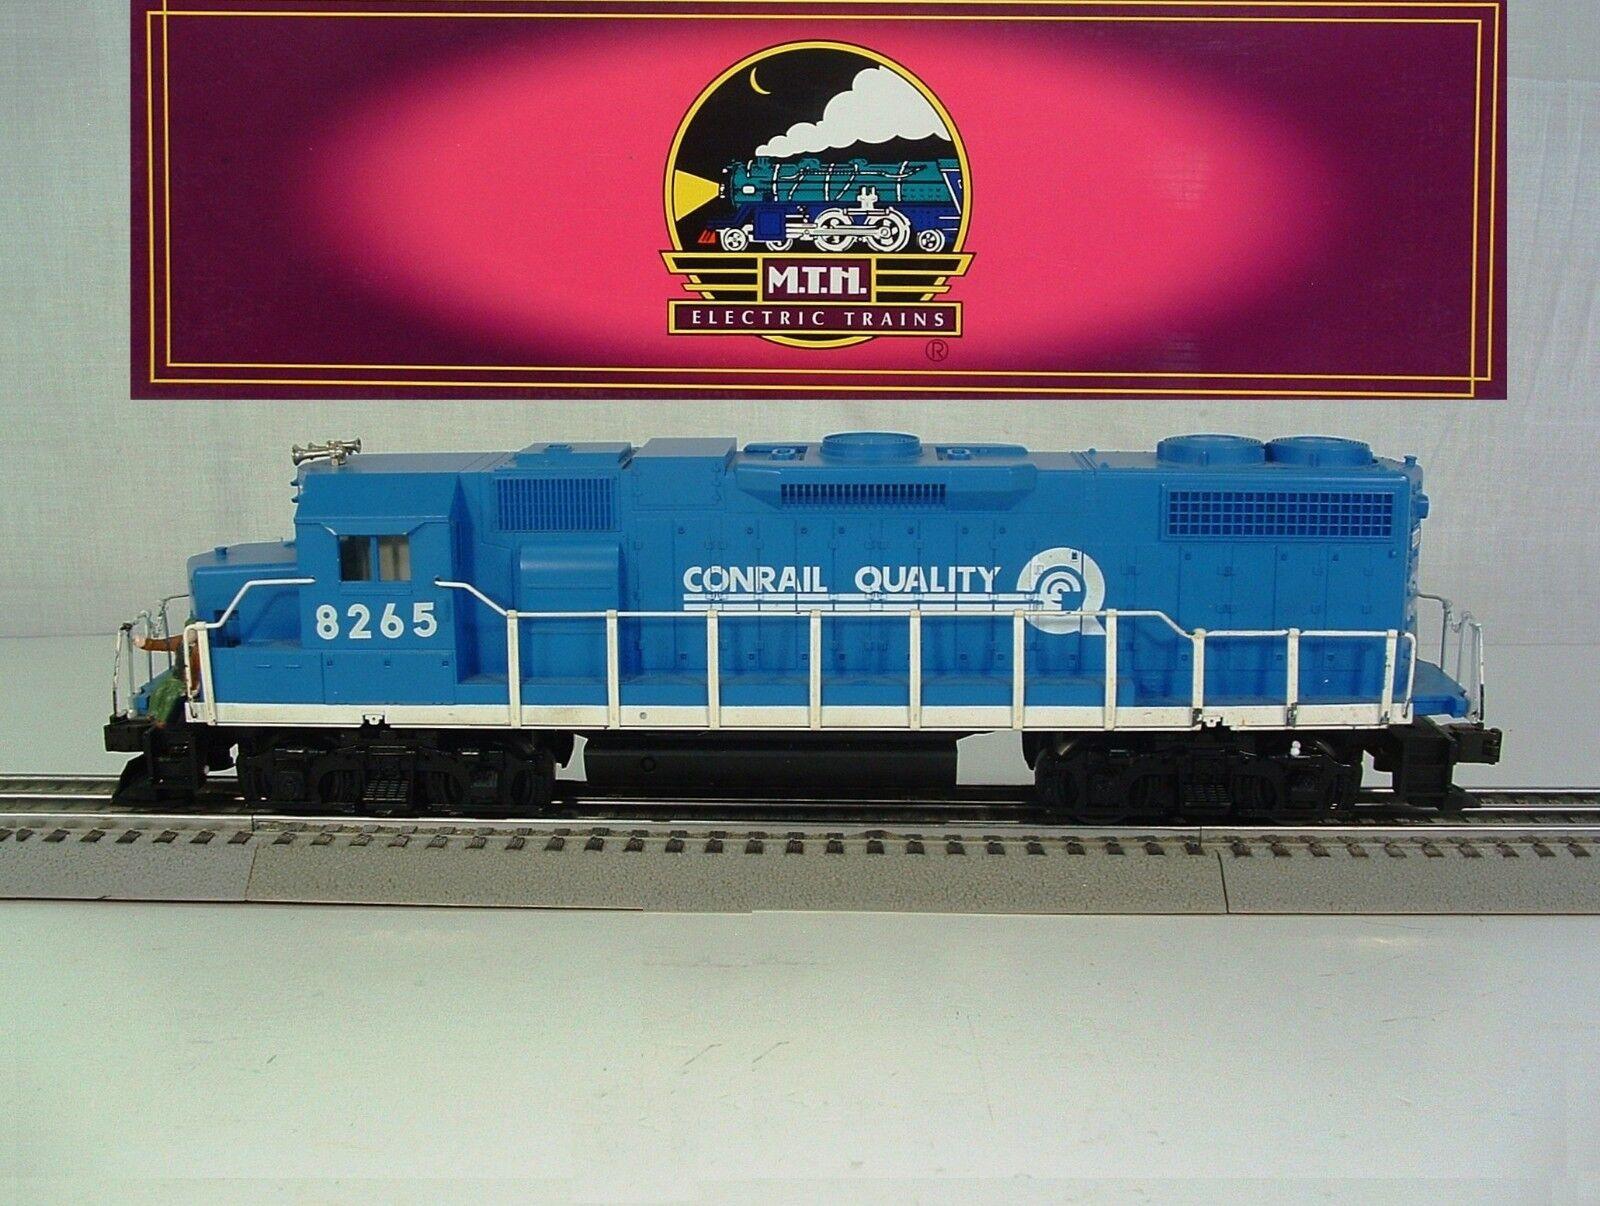 Mth 20 - 2157 - - - 1 Premier conrail EMD gp38 - 2 diesel f77